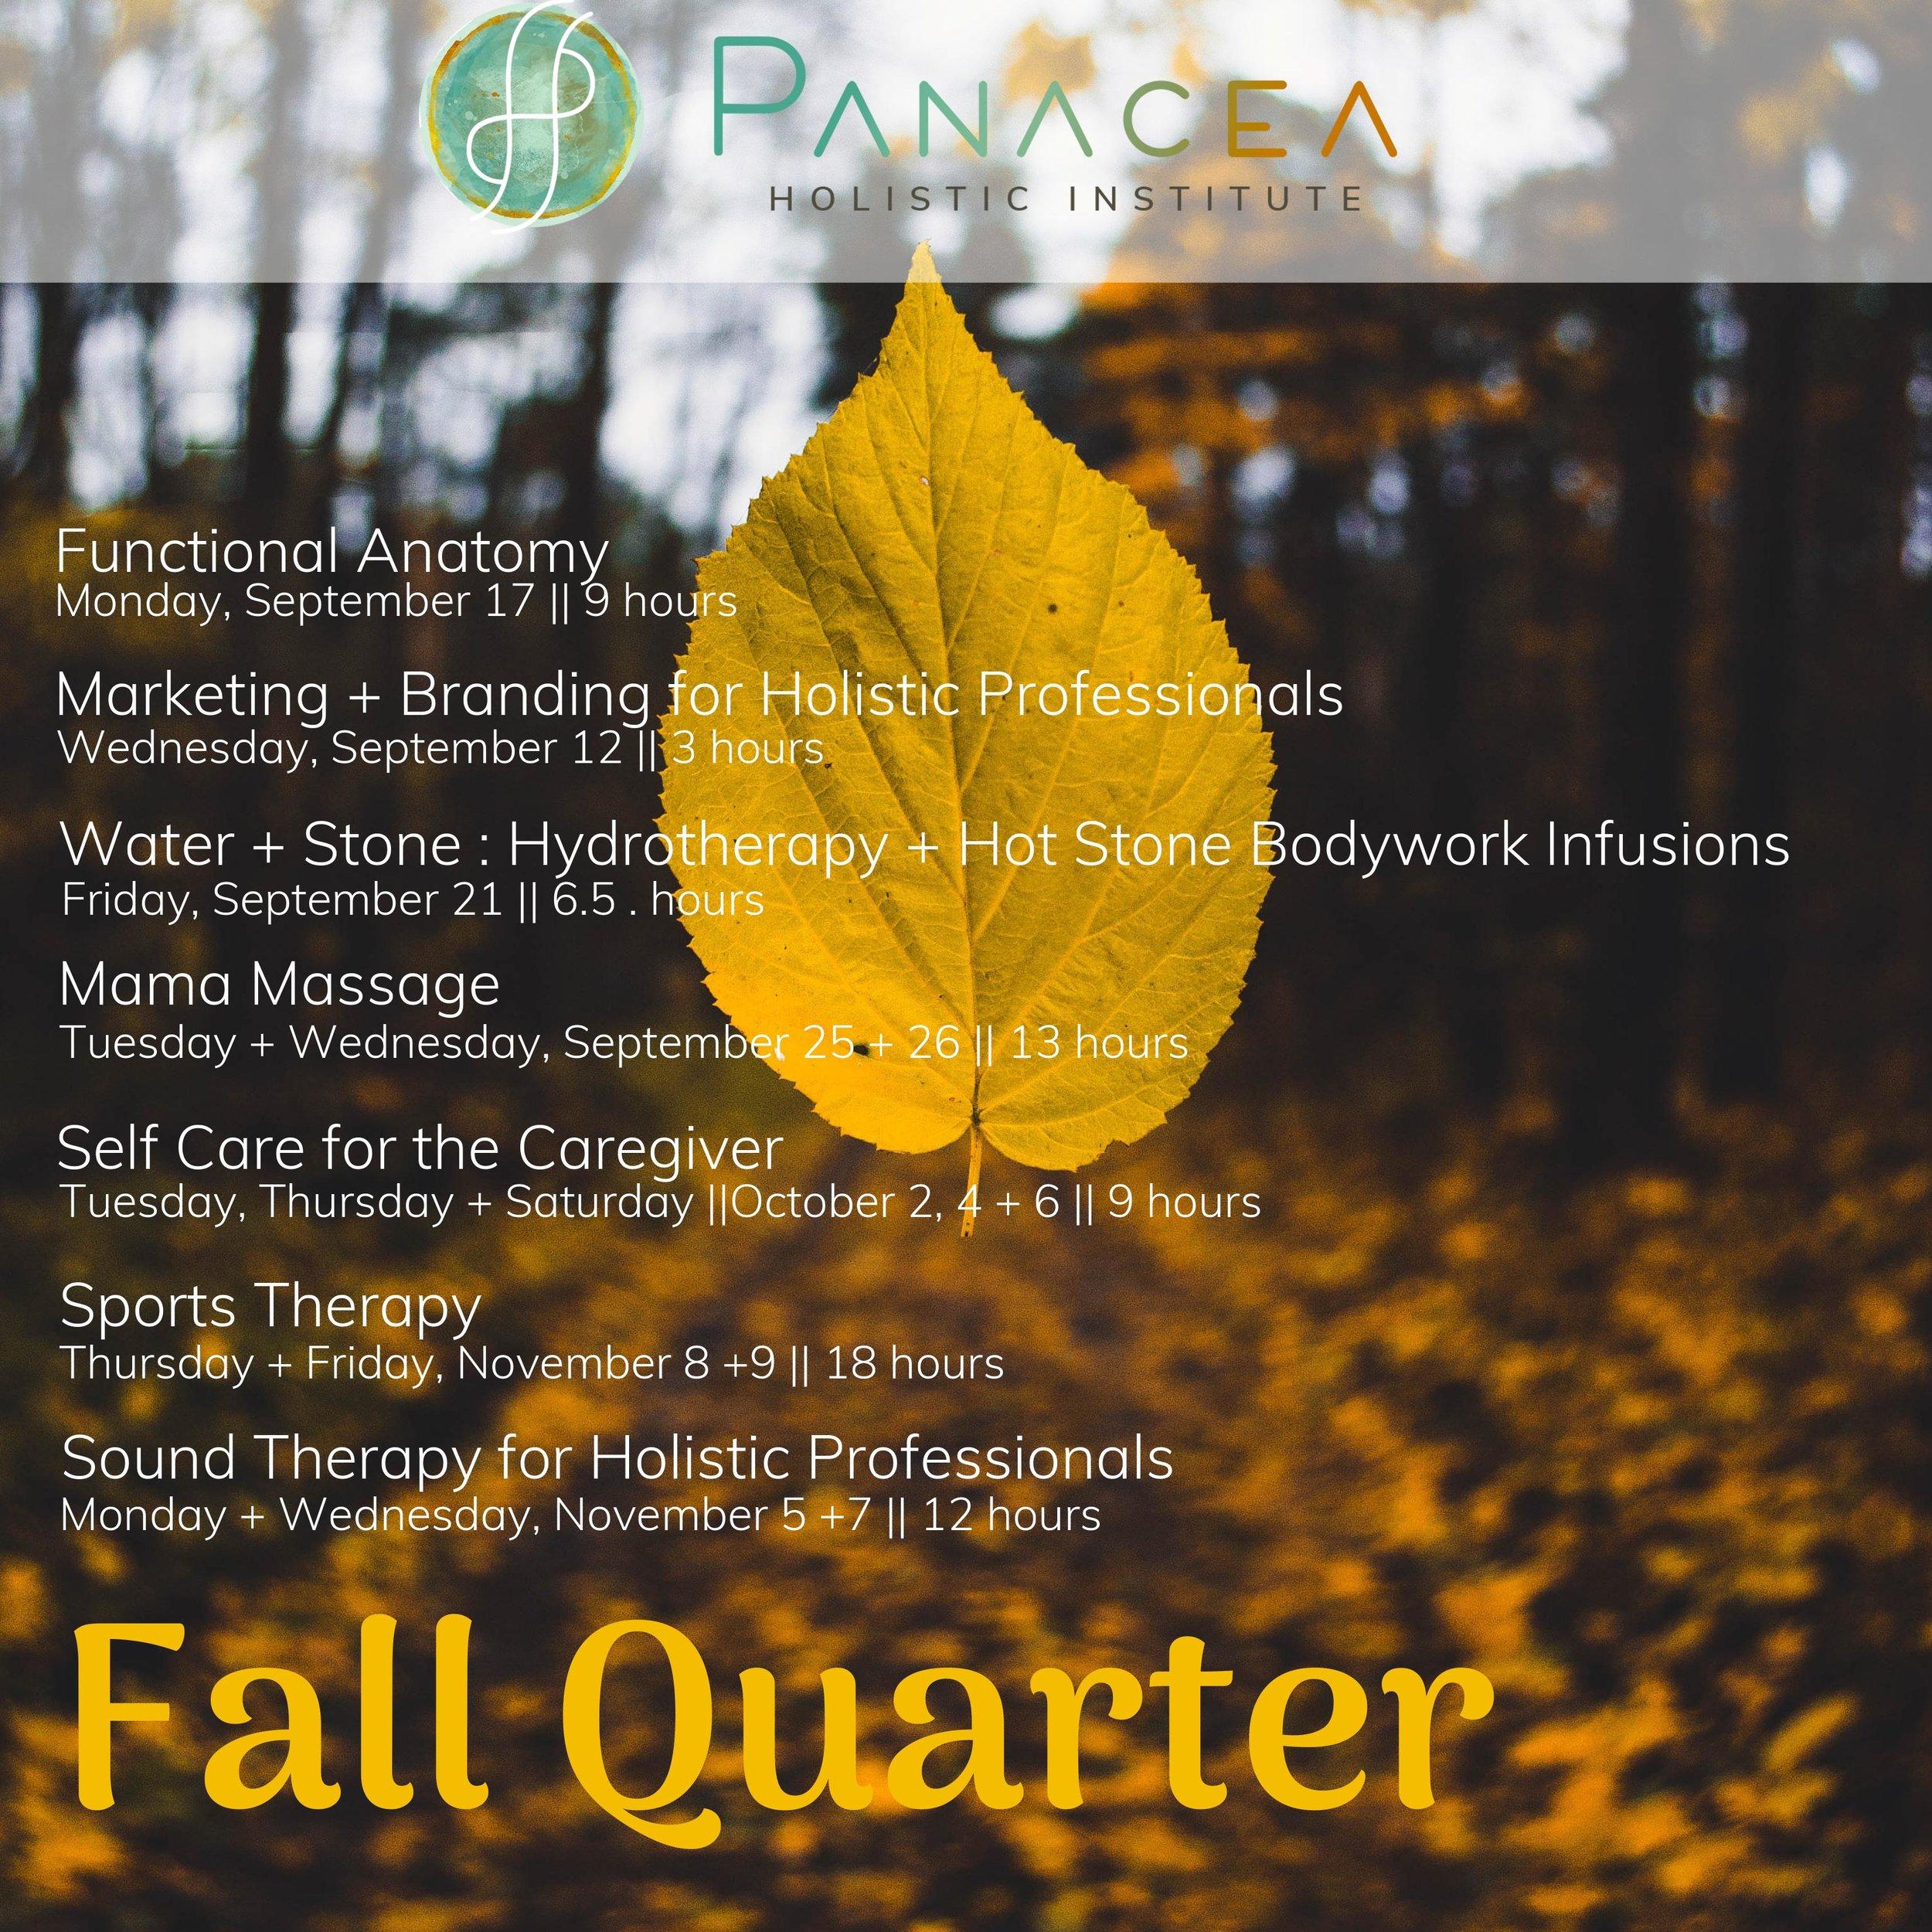 fall quarter.jpg